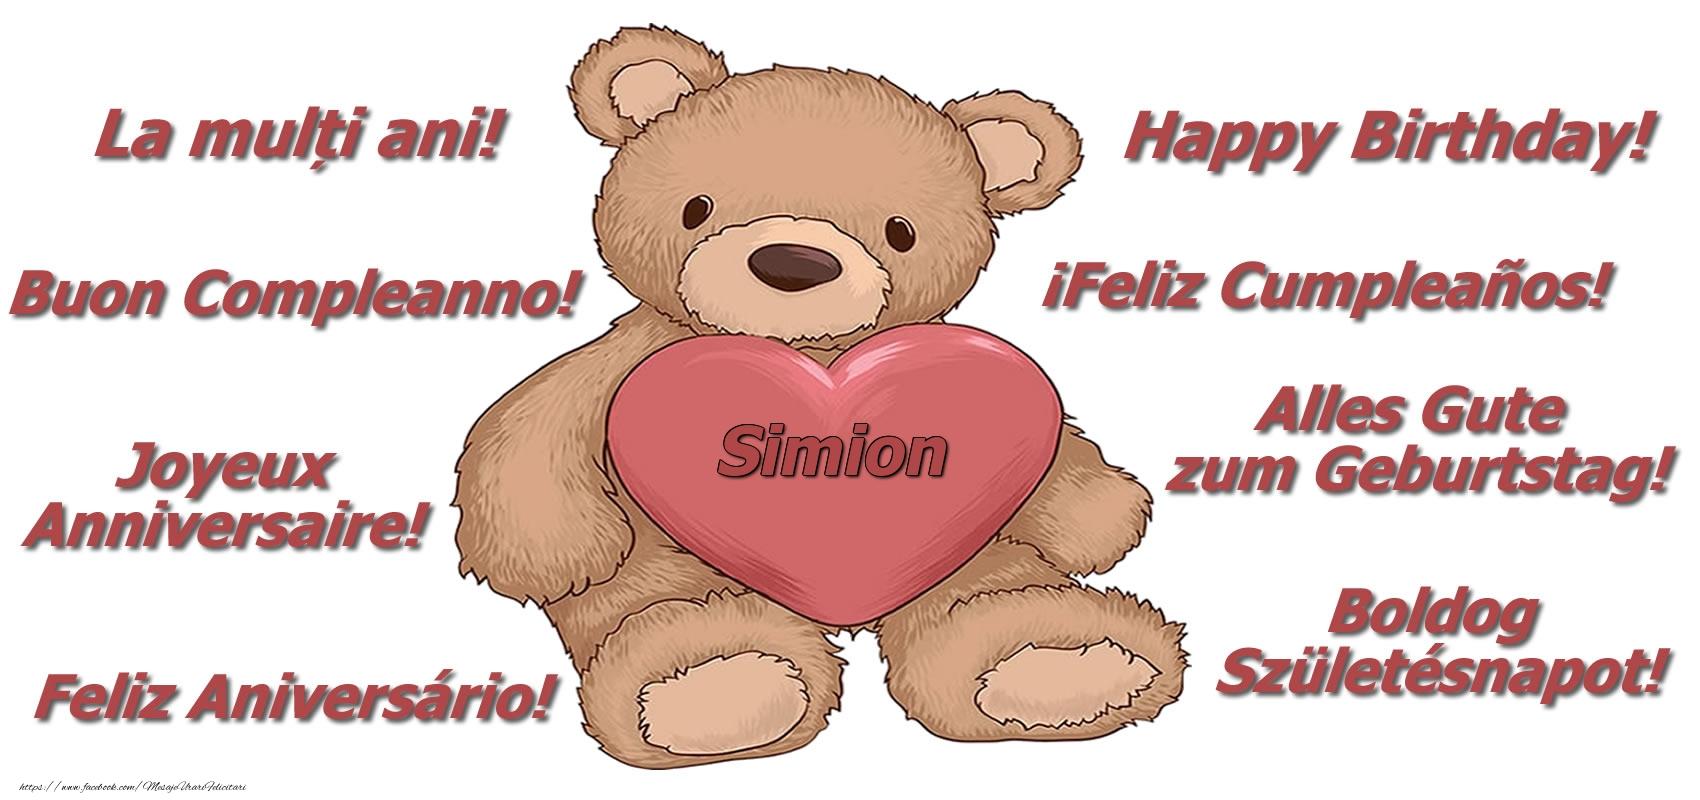 Felicitari de zi de nastere - La multi ani Simion! - Ursulet